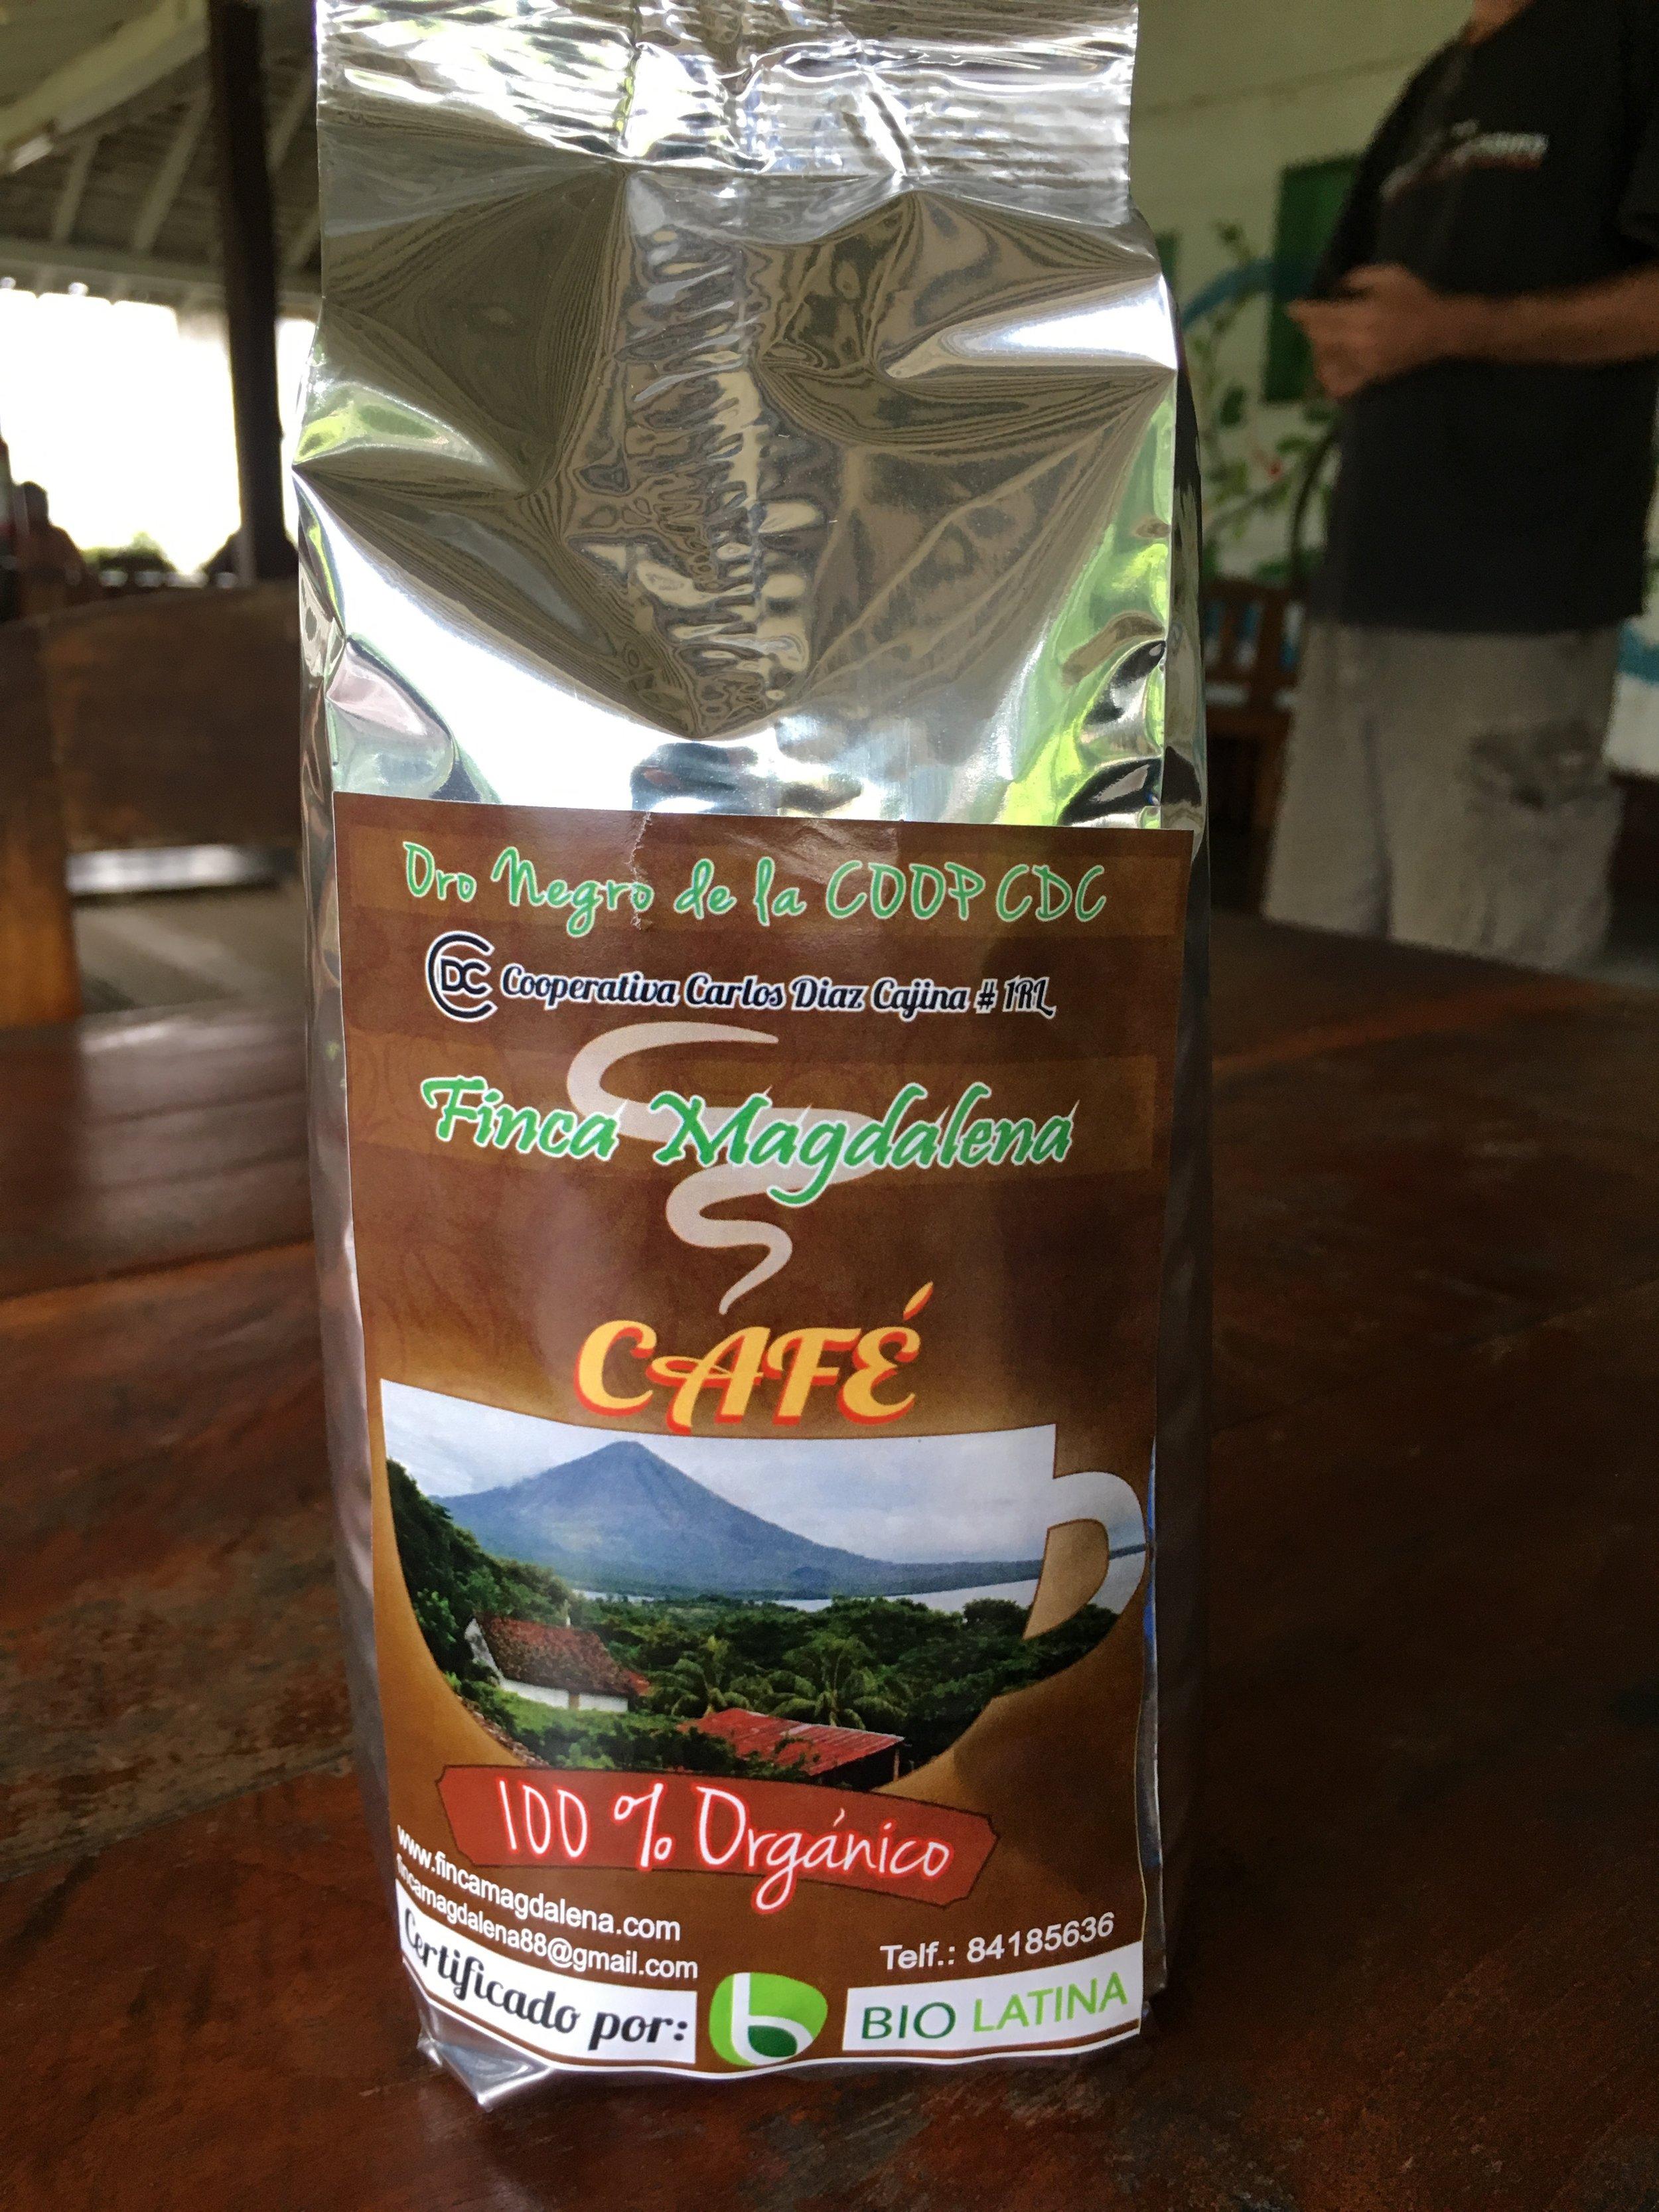 Whole bean coffee for 300 cordobas a bag